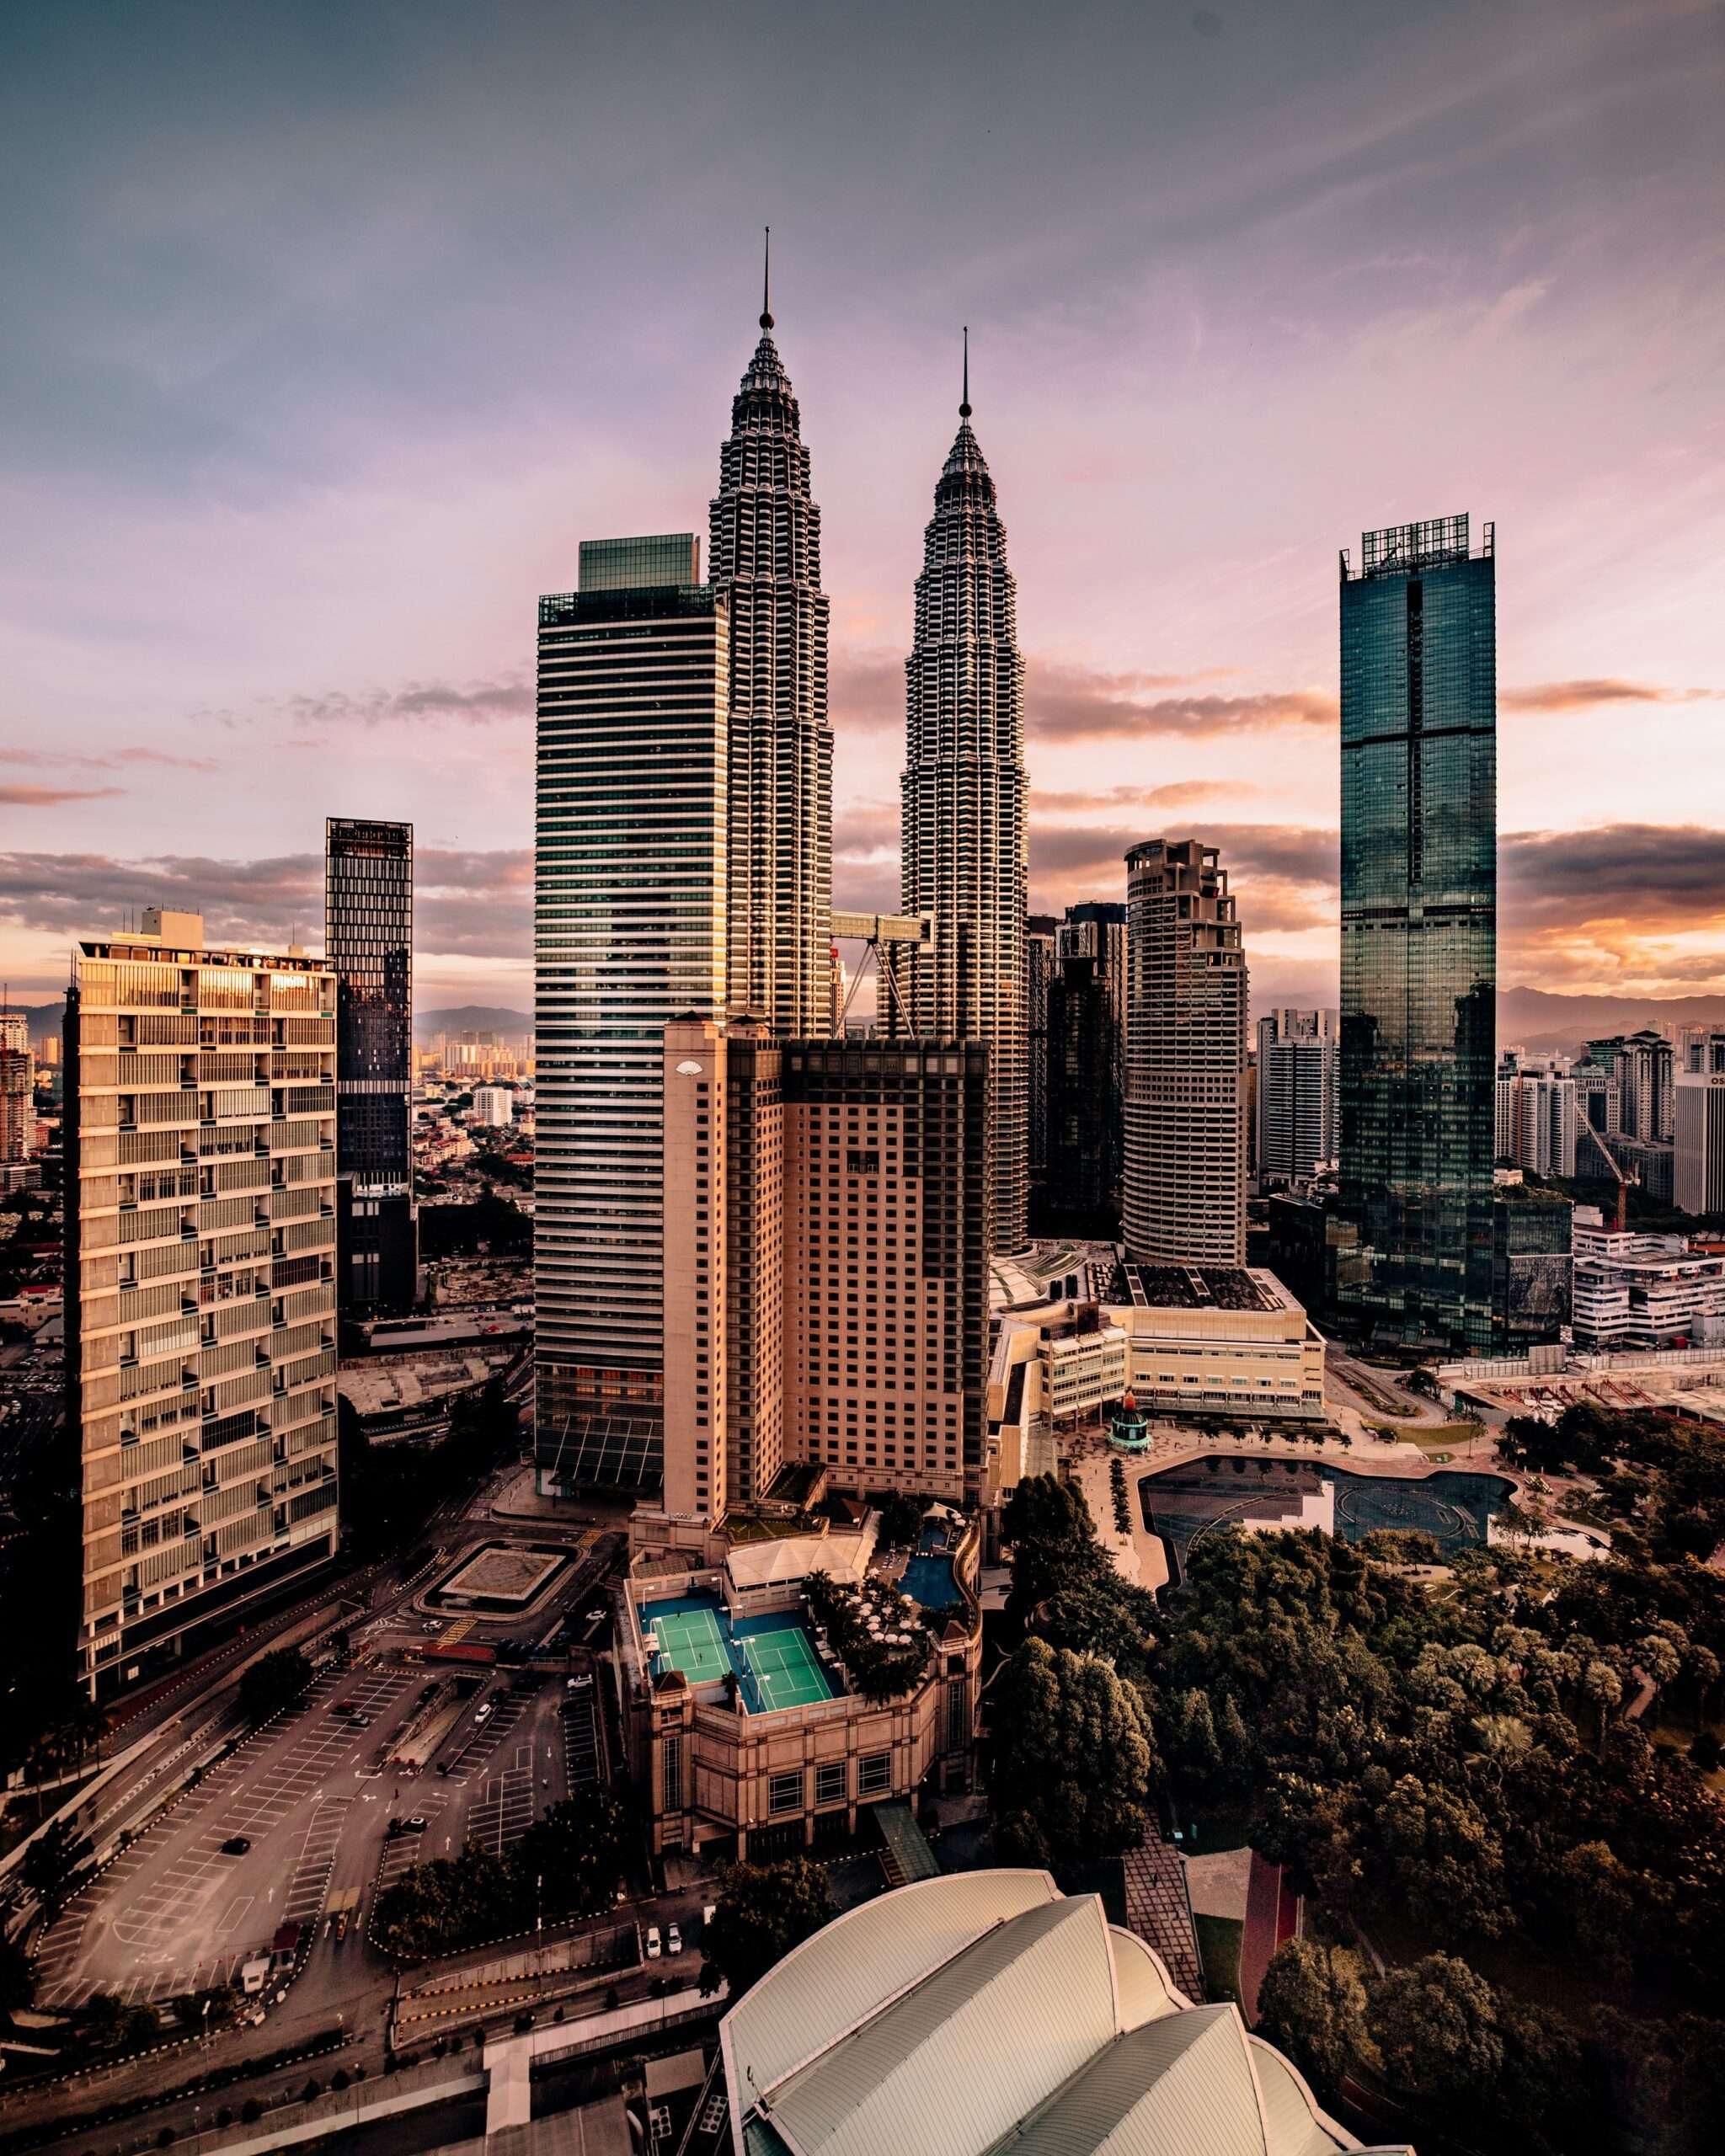 Kuala Lumpur skyline with Petronas Towers at sunset